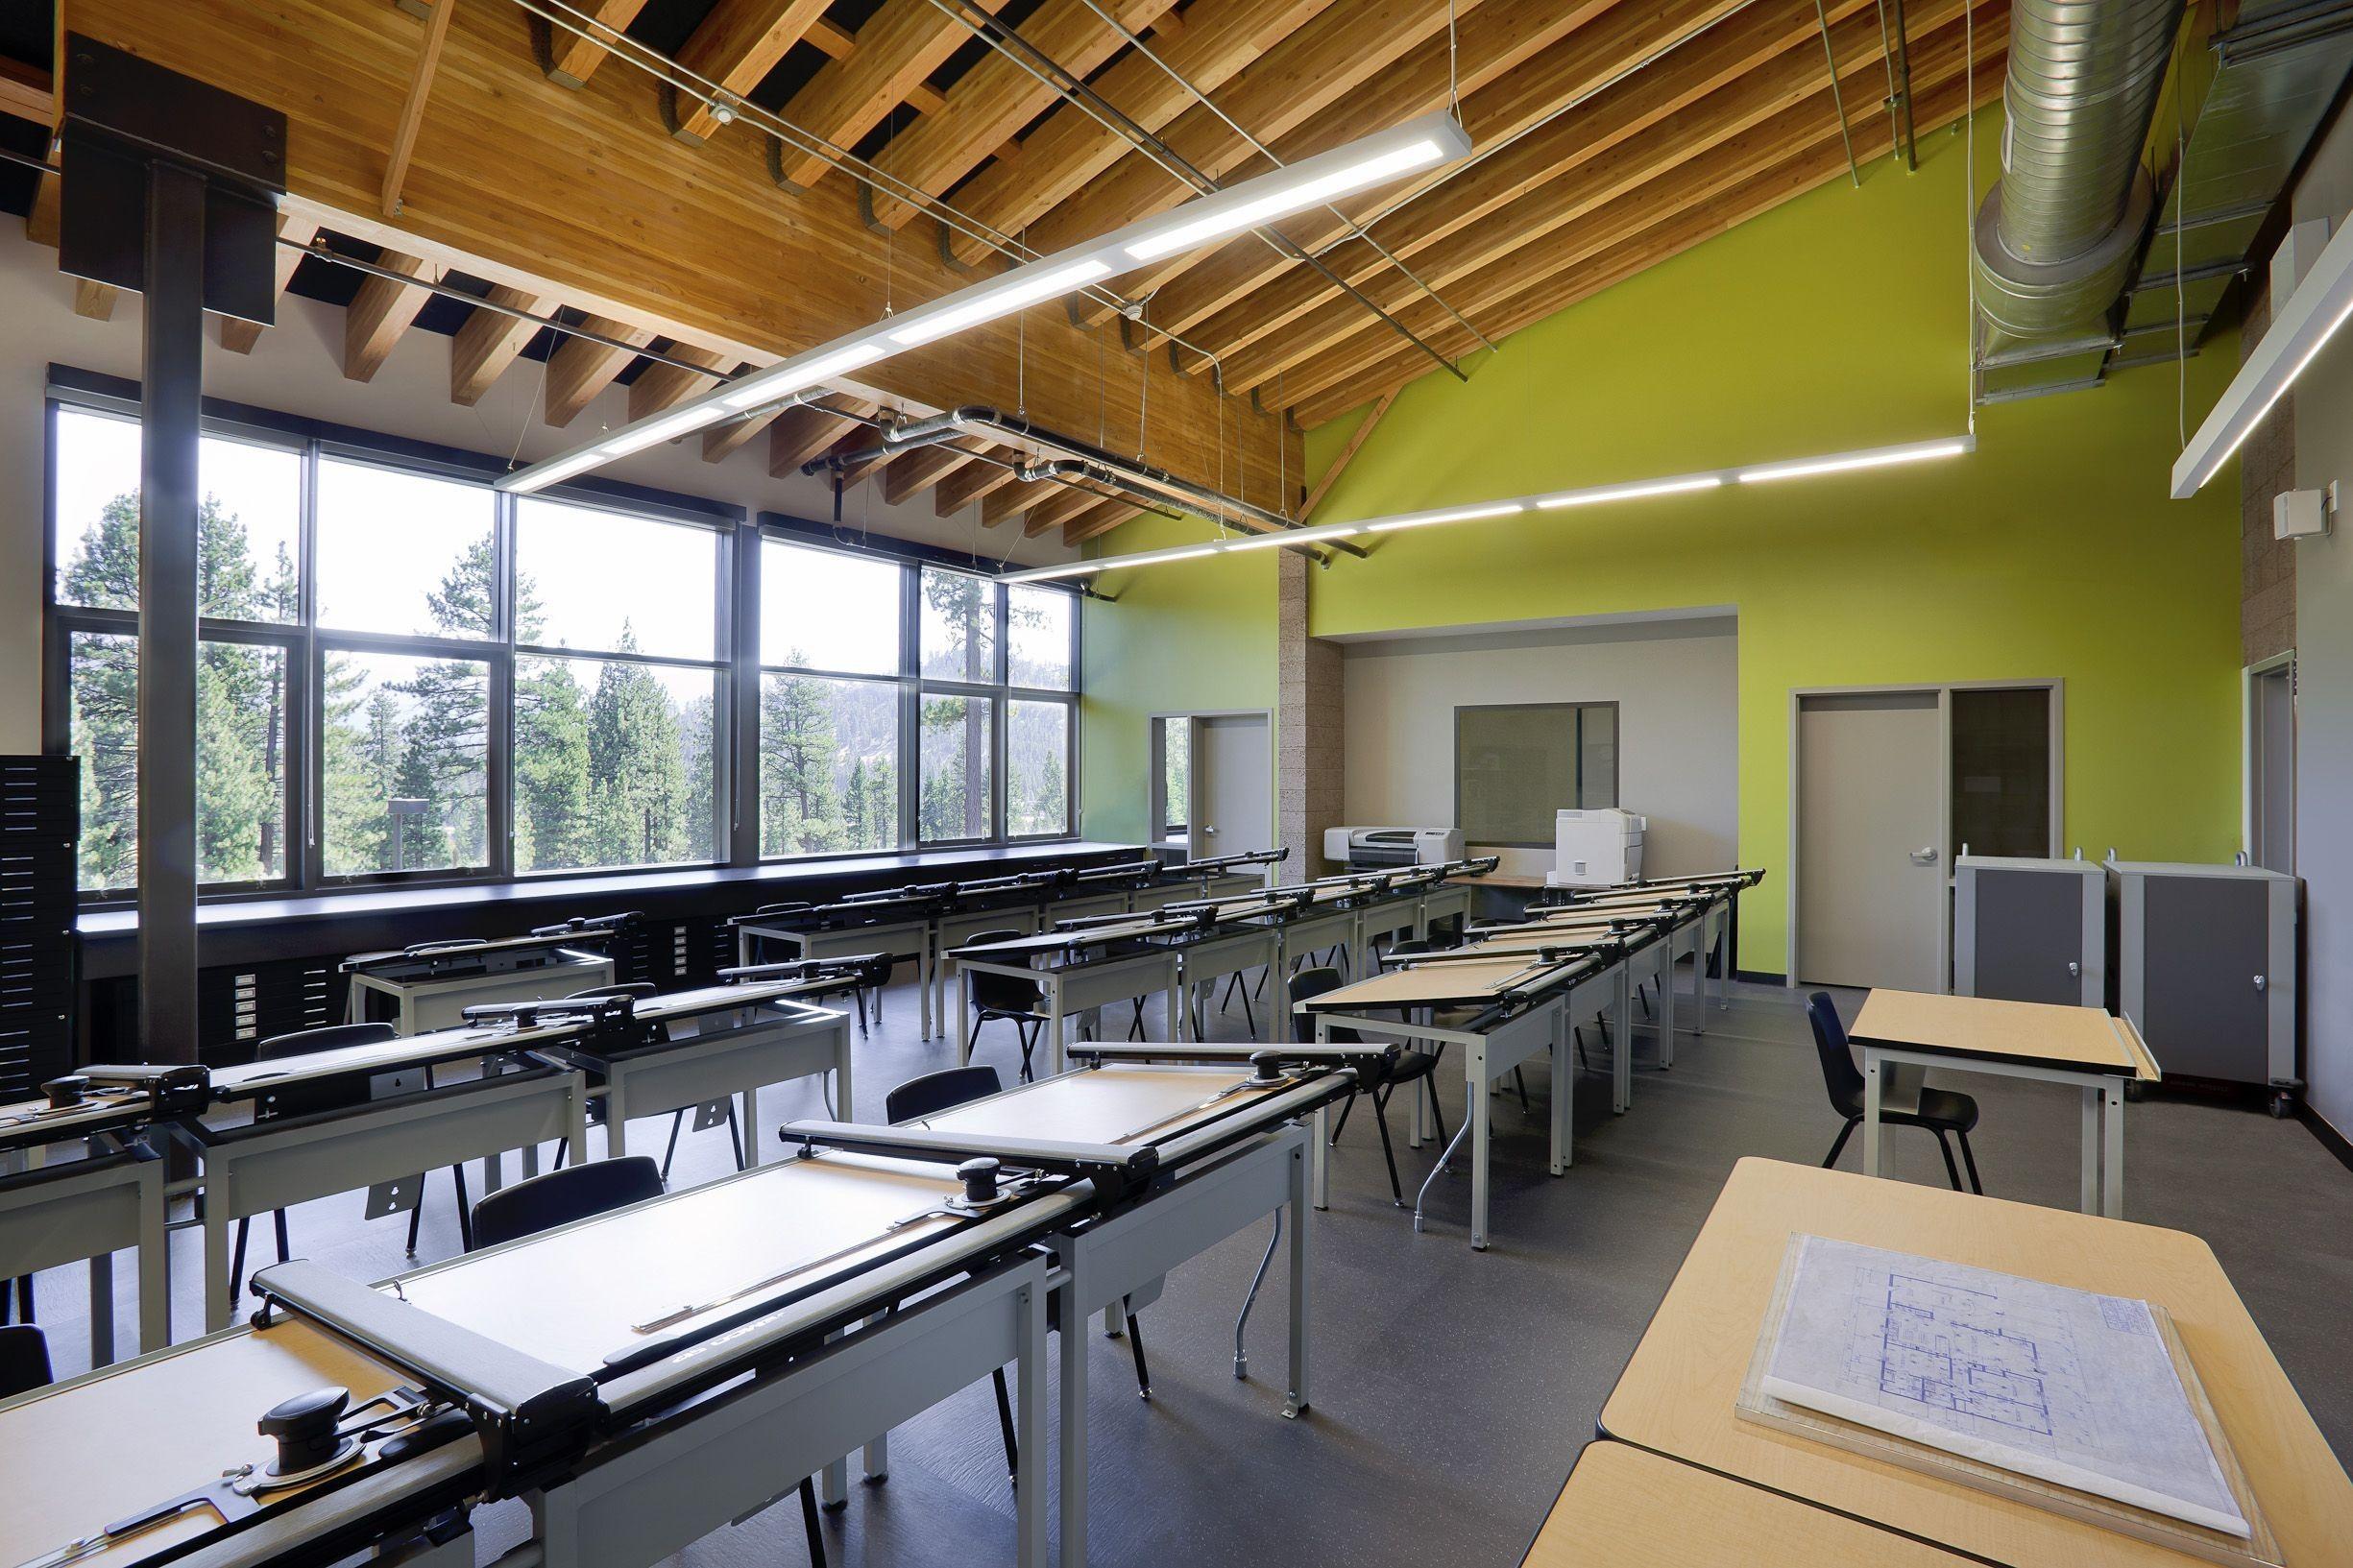 Reach In Closet Design Very Awful High School Modern